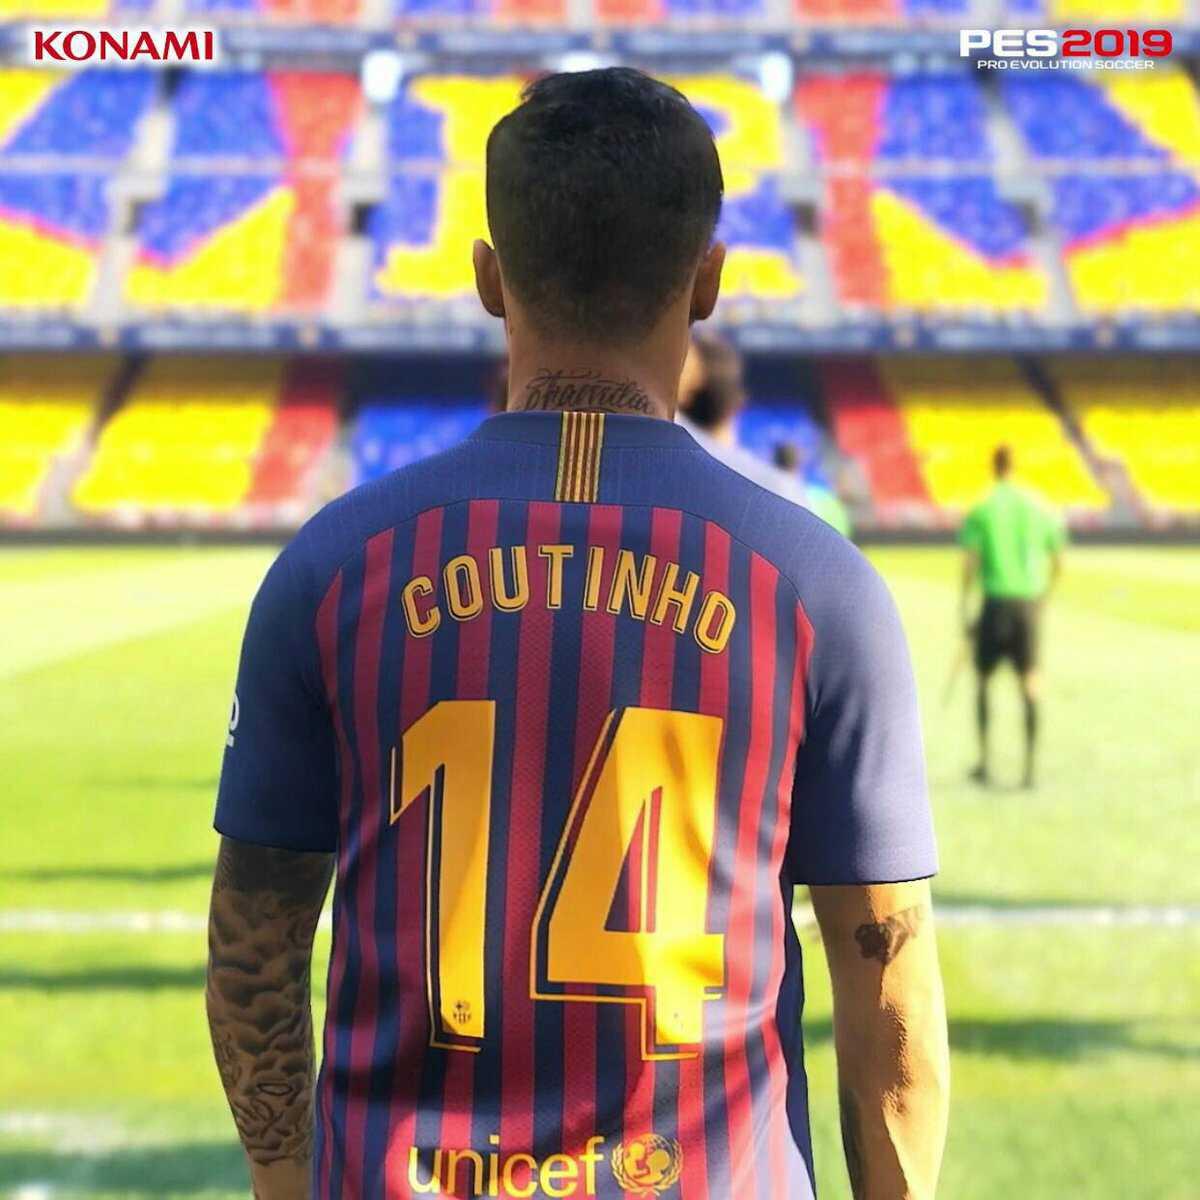 Pes 2019 Coutinho Stats   Pro Evolution Soccer